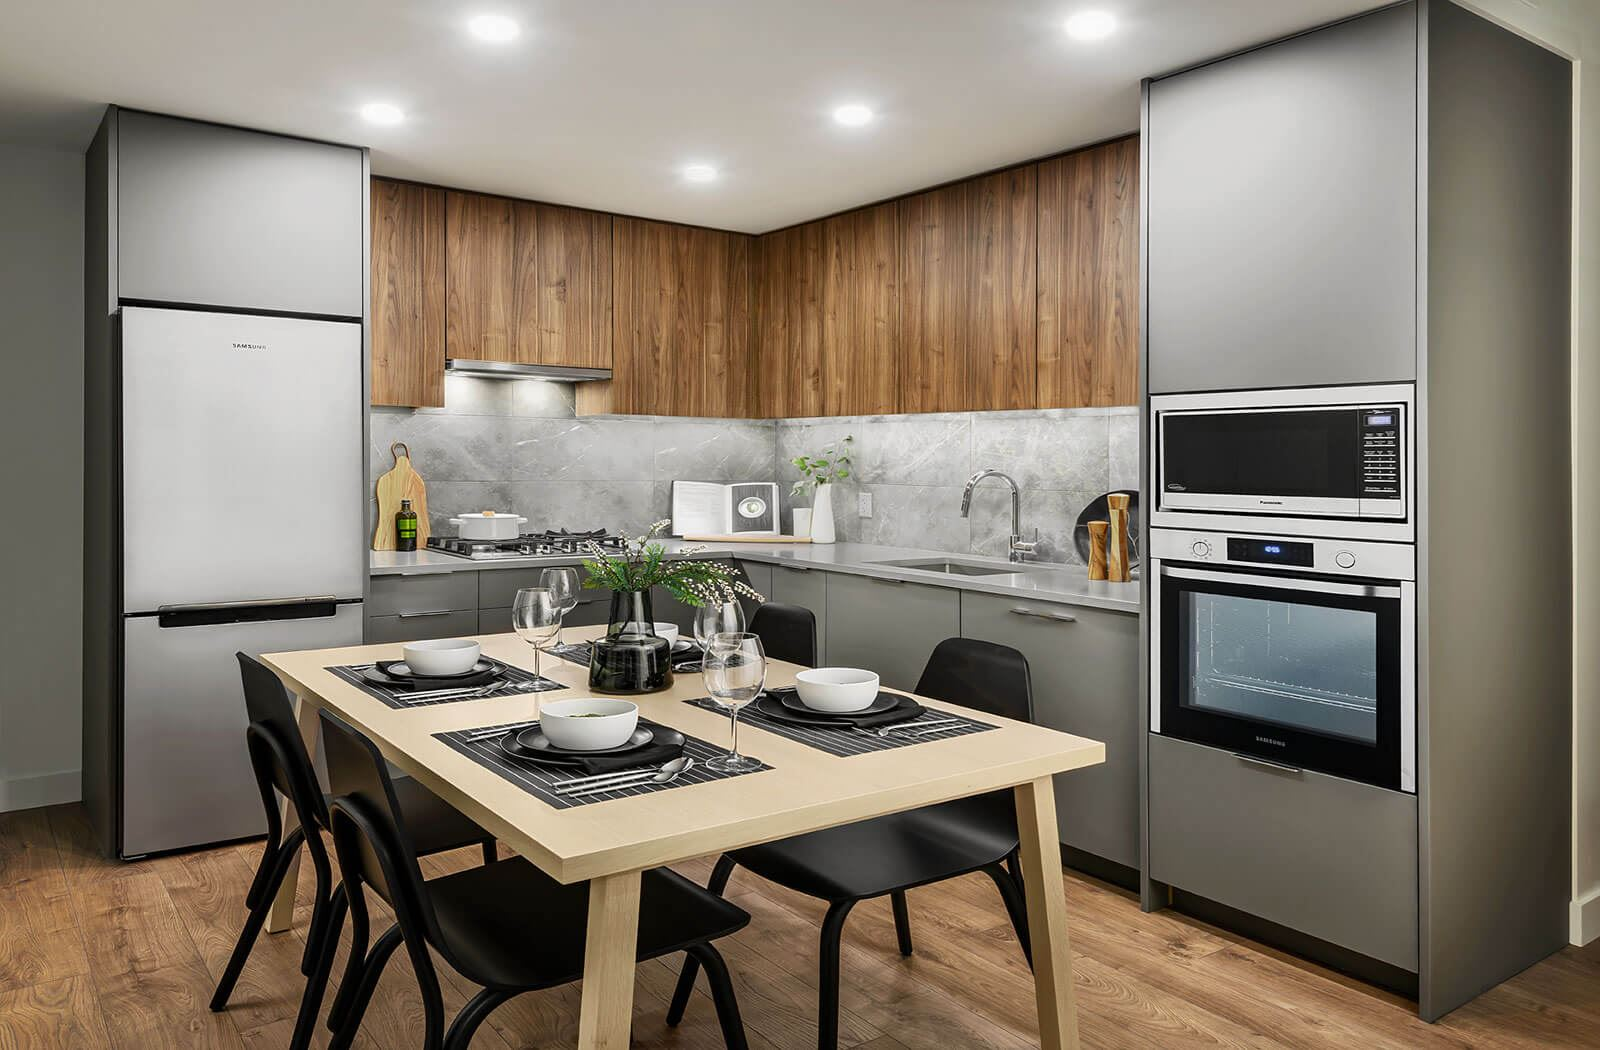 2020 07 17 06 25 36 interiors display kitchen1.fc4defa2